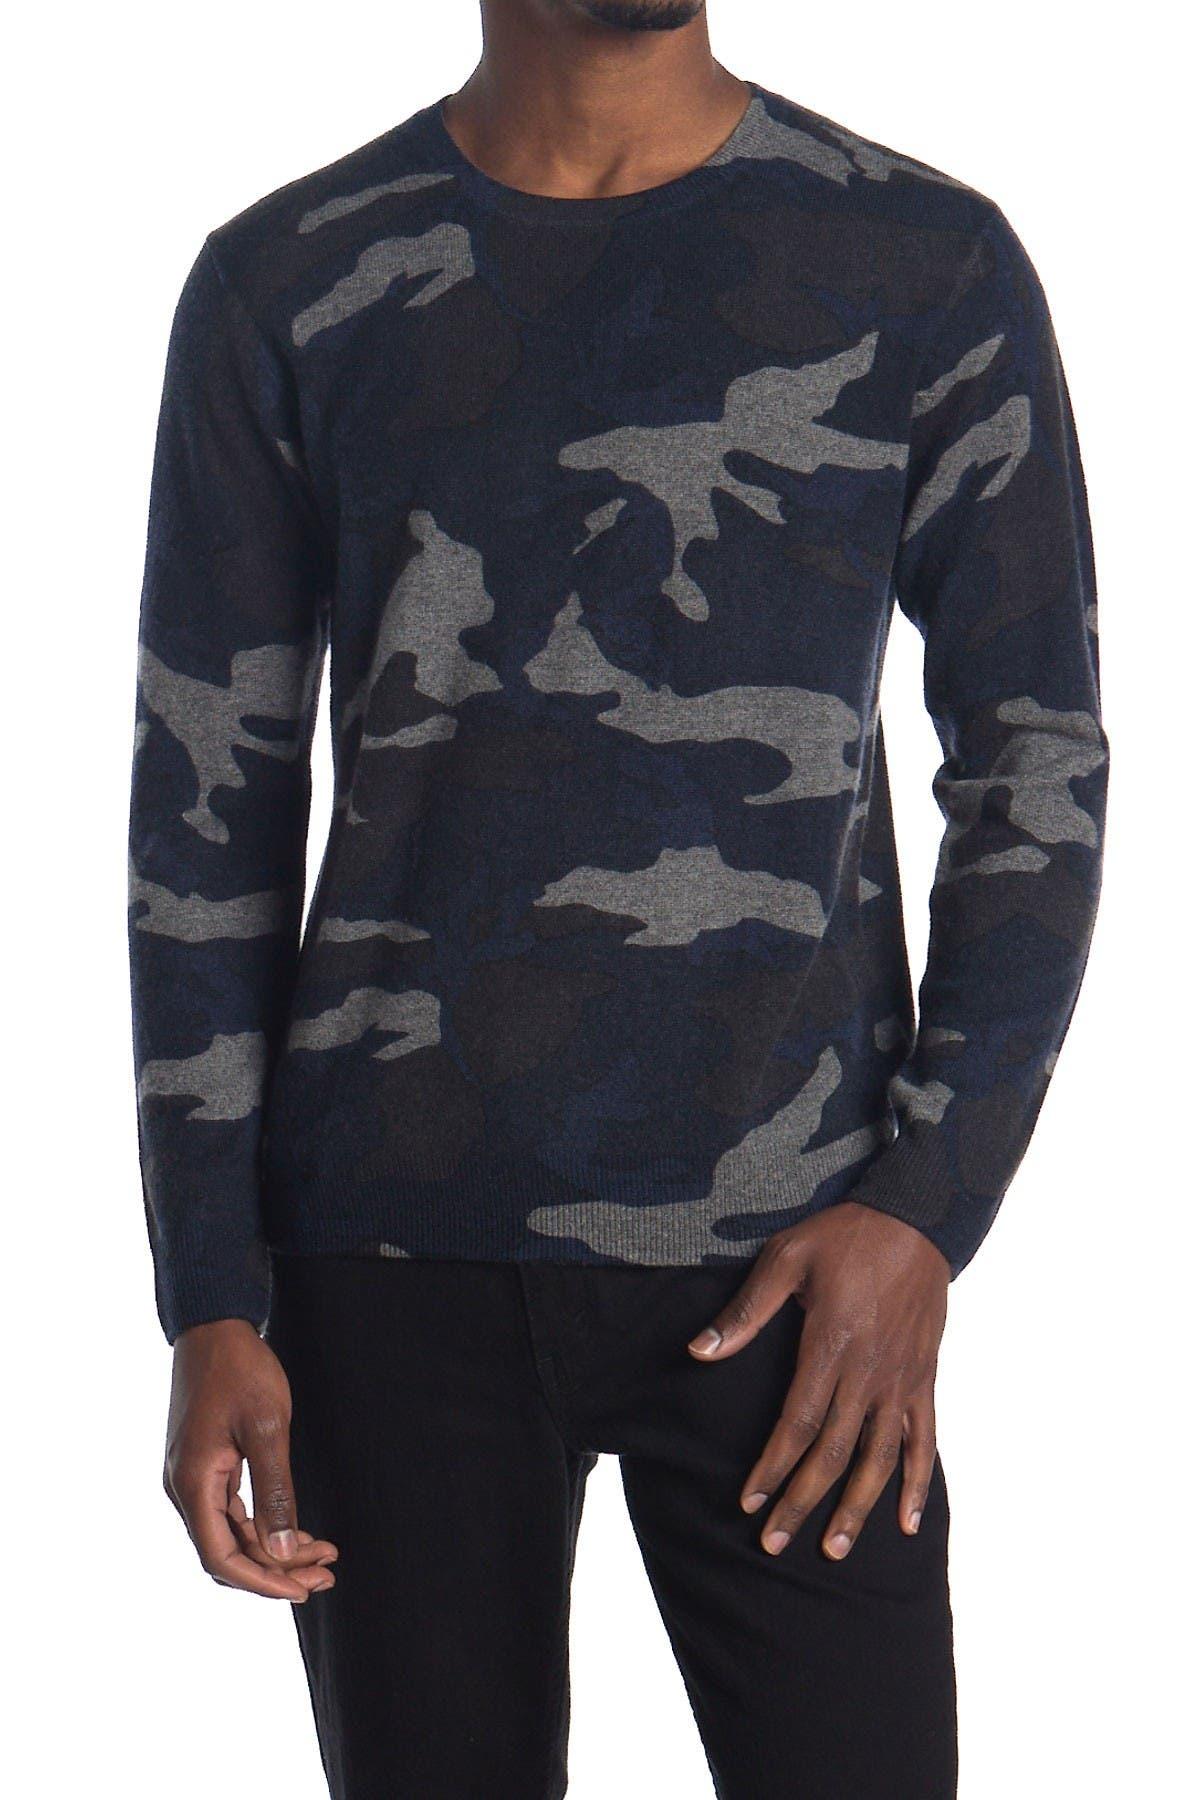 Image of Stewart of Scotland Camo Print Cashmere Sweater